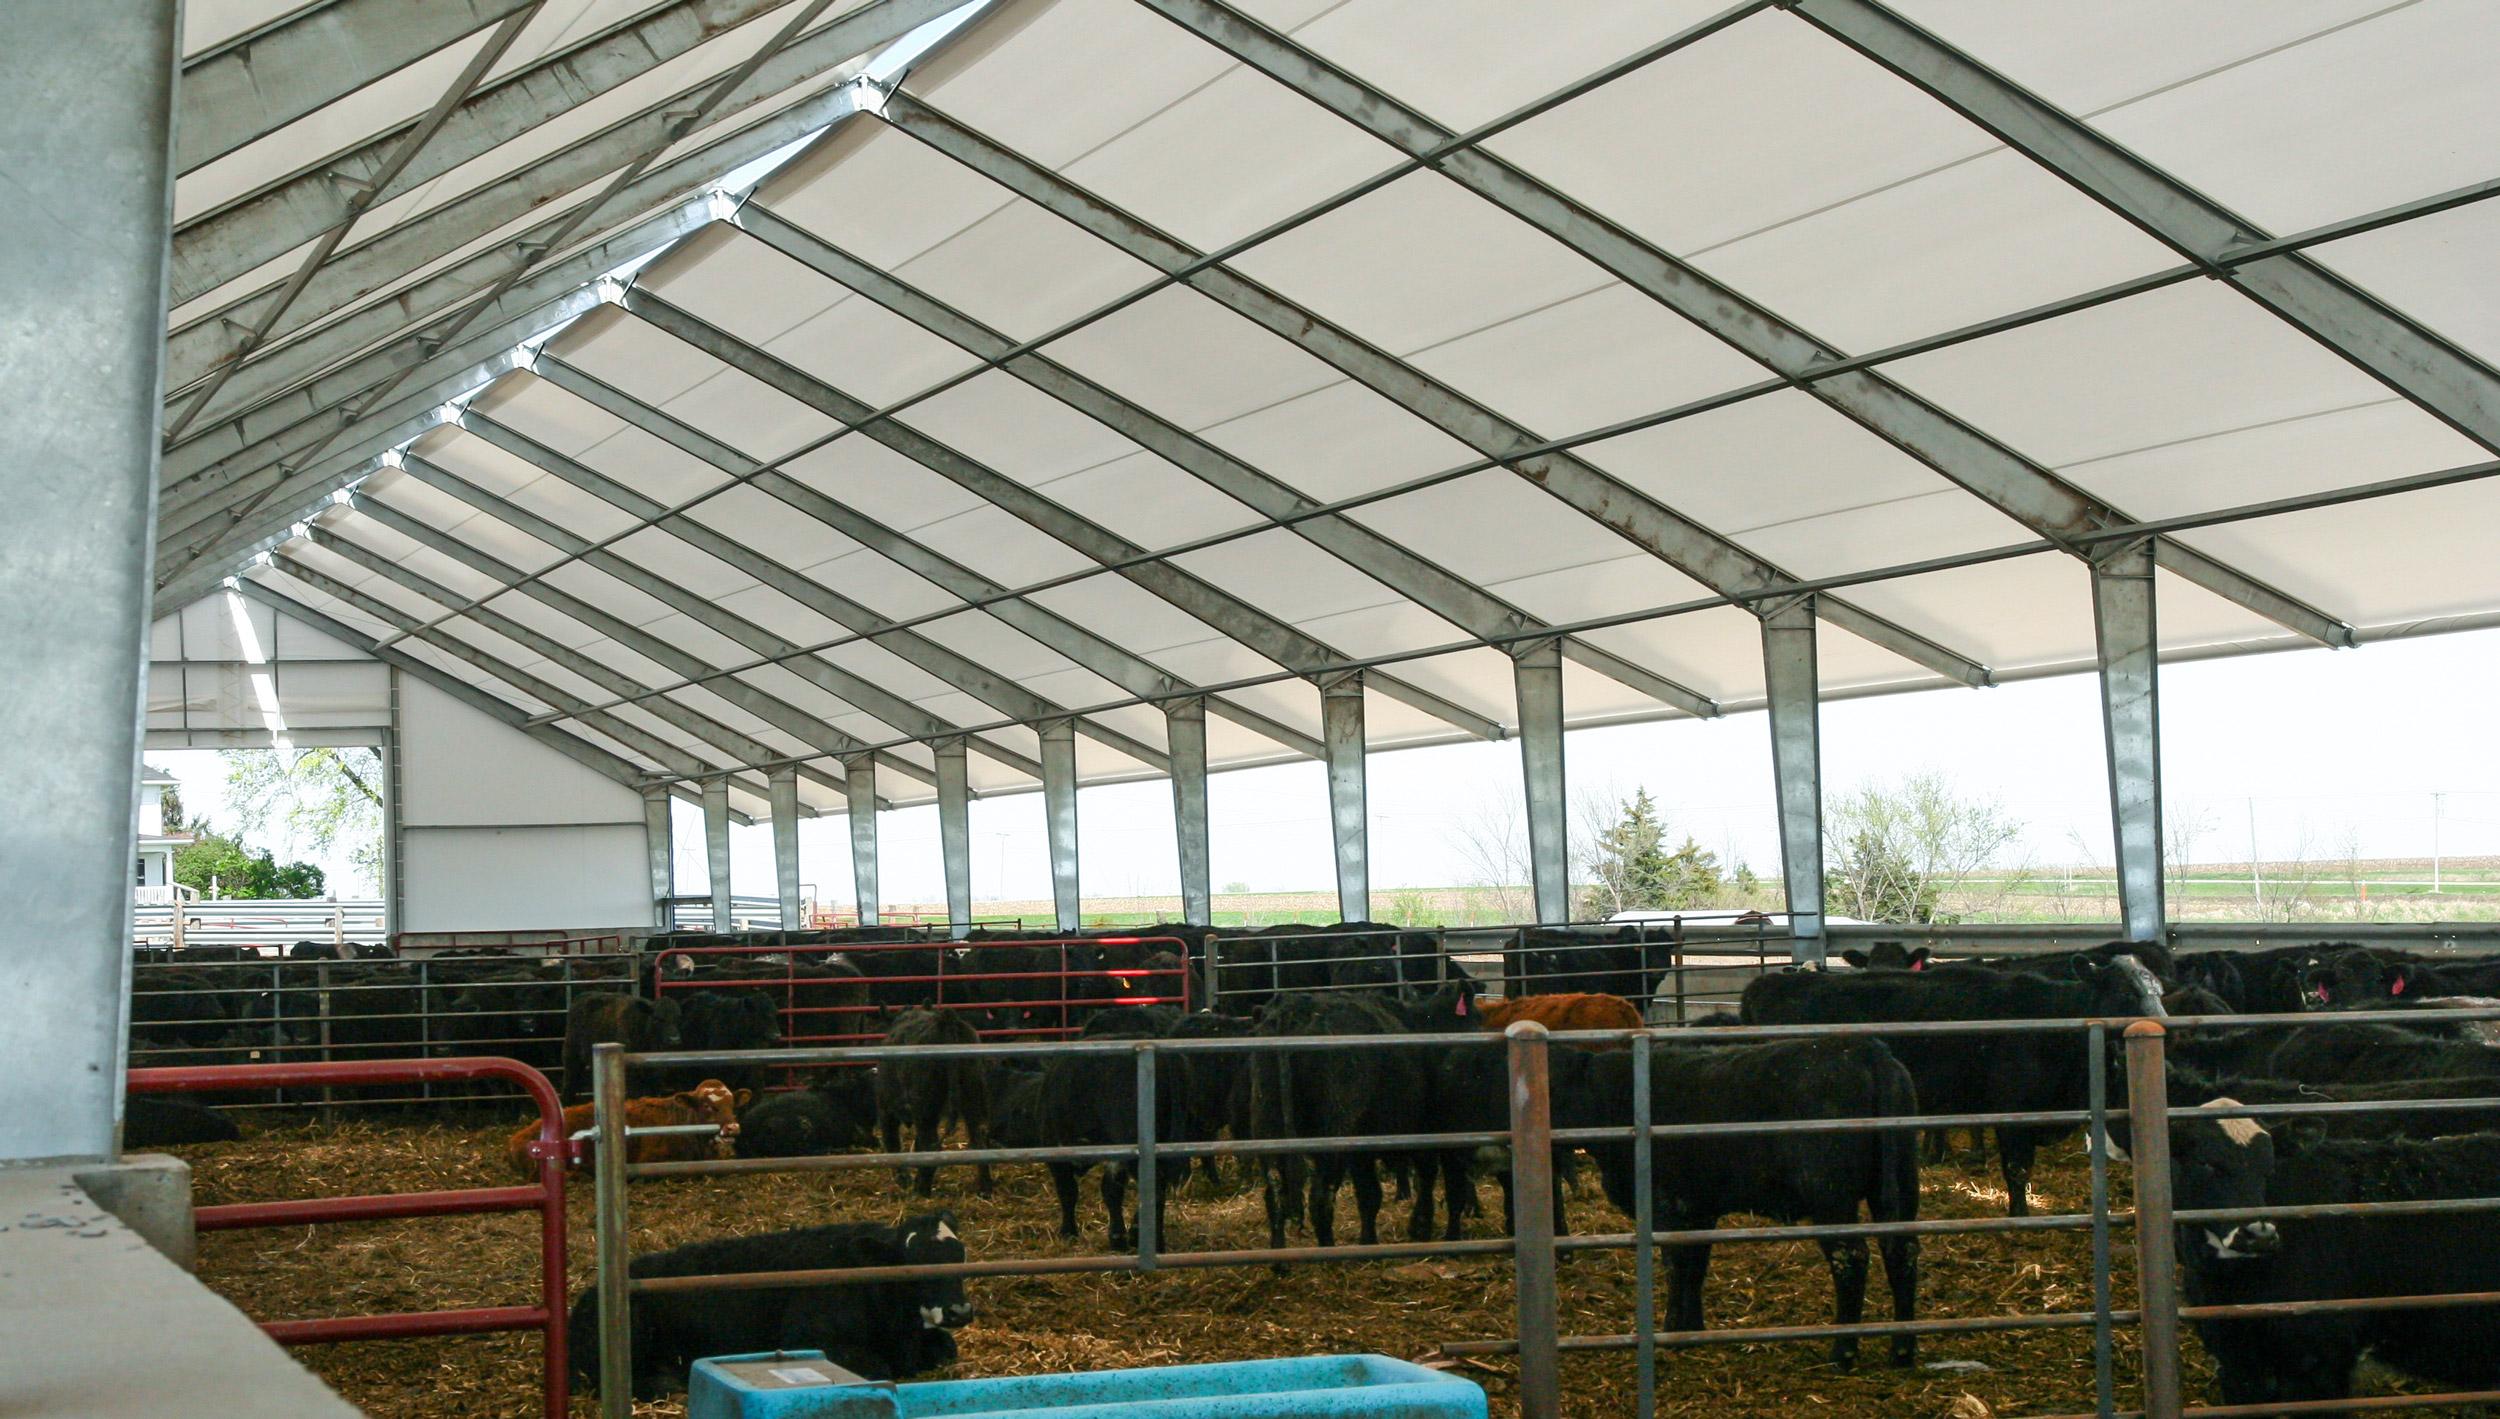 fabric cattle barn interior